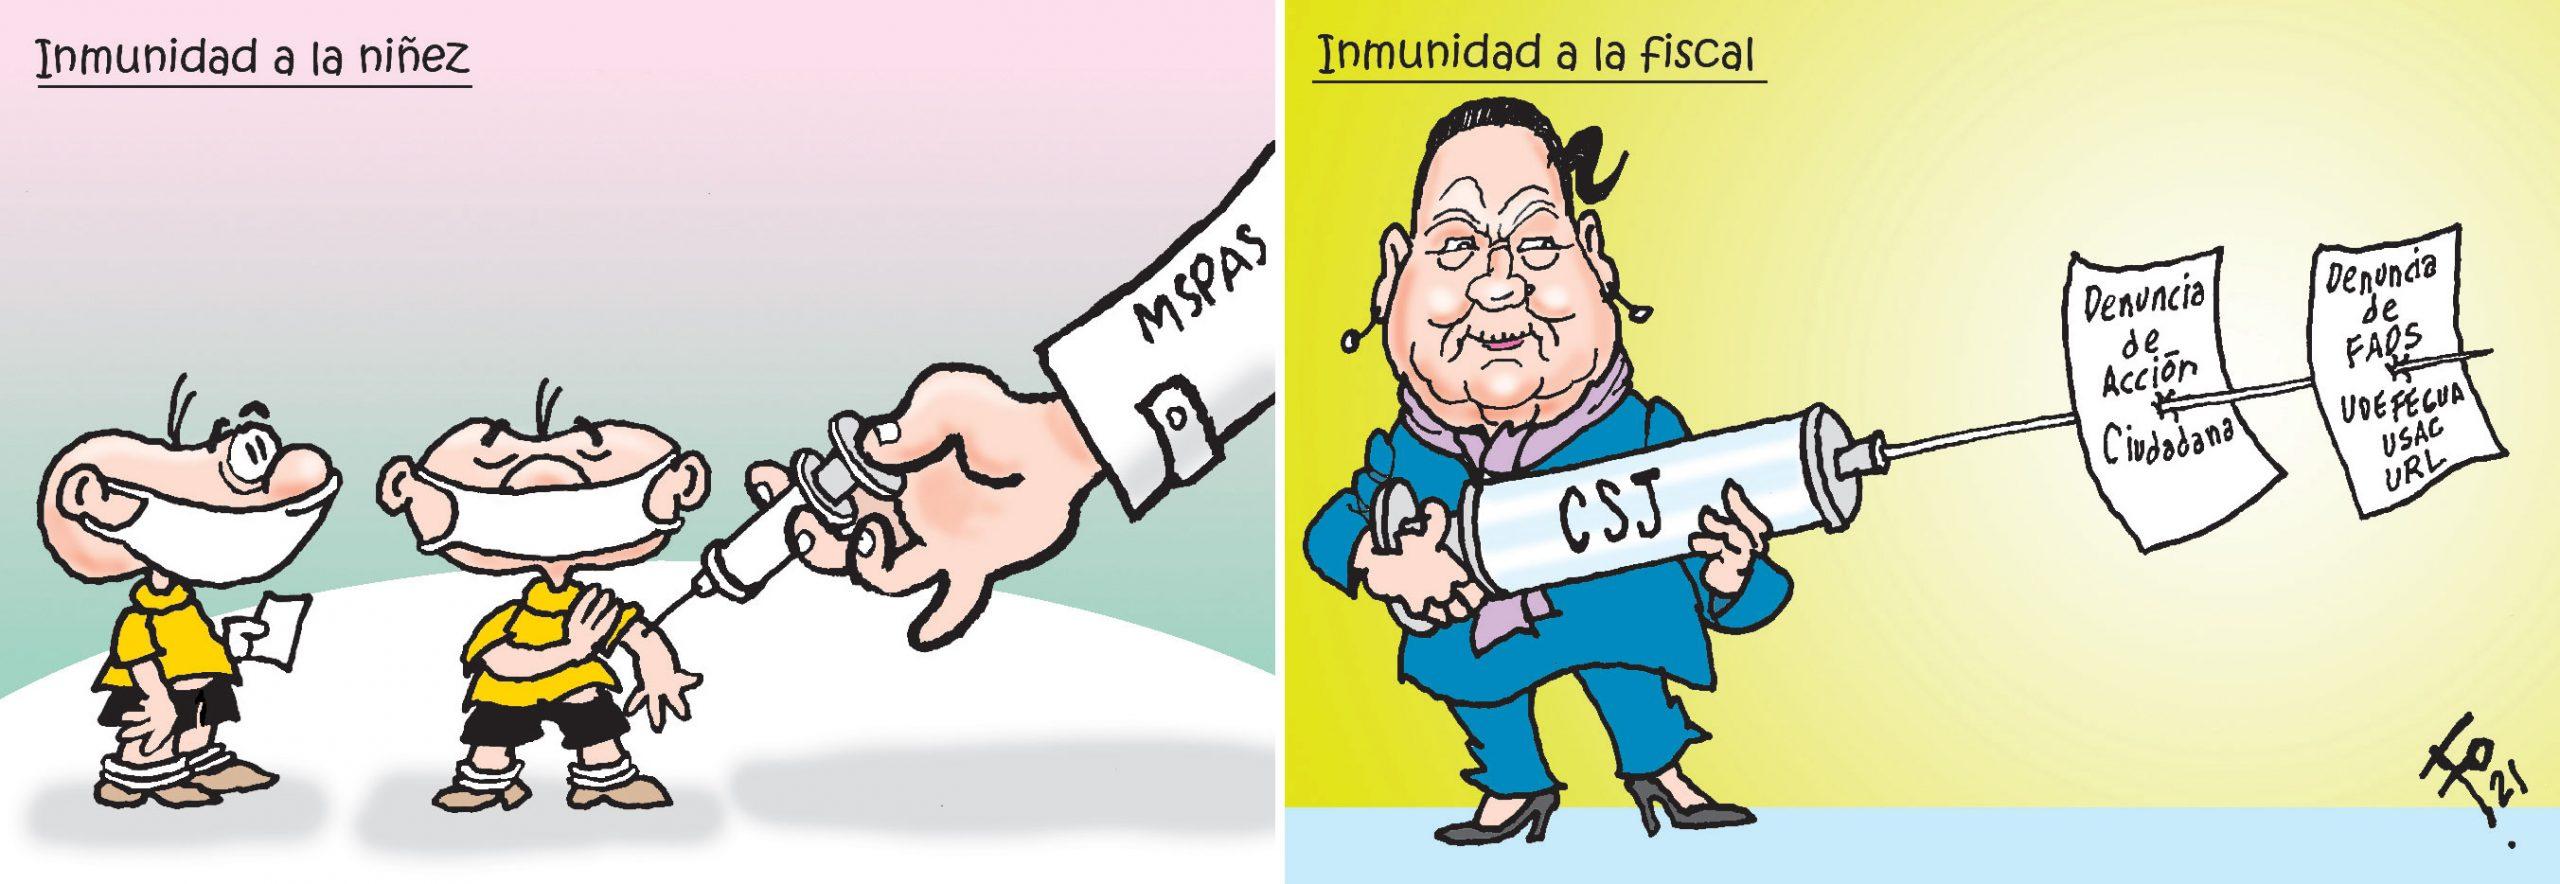 Fo: inmunidad infantil